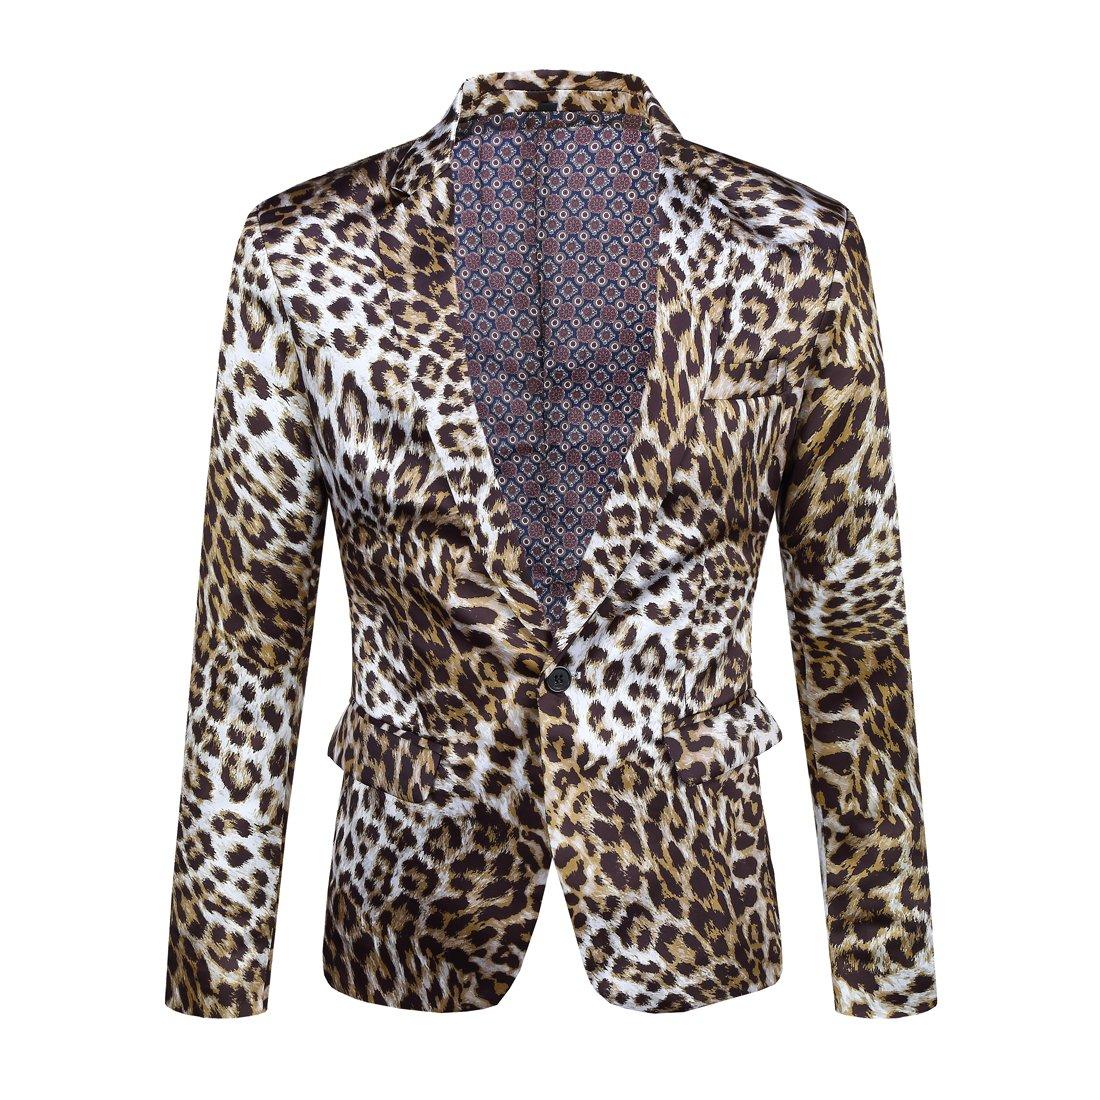 CARFFIV Men's Plus Size Fashion Casual Print Suit Jacket Blazer (Tag L (US S) Chest 39'', Leopard) by CARFFIV